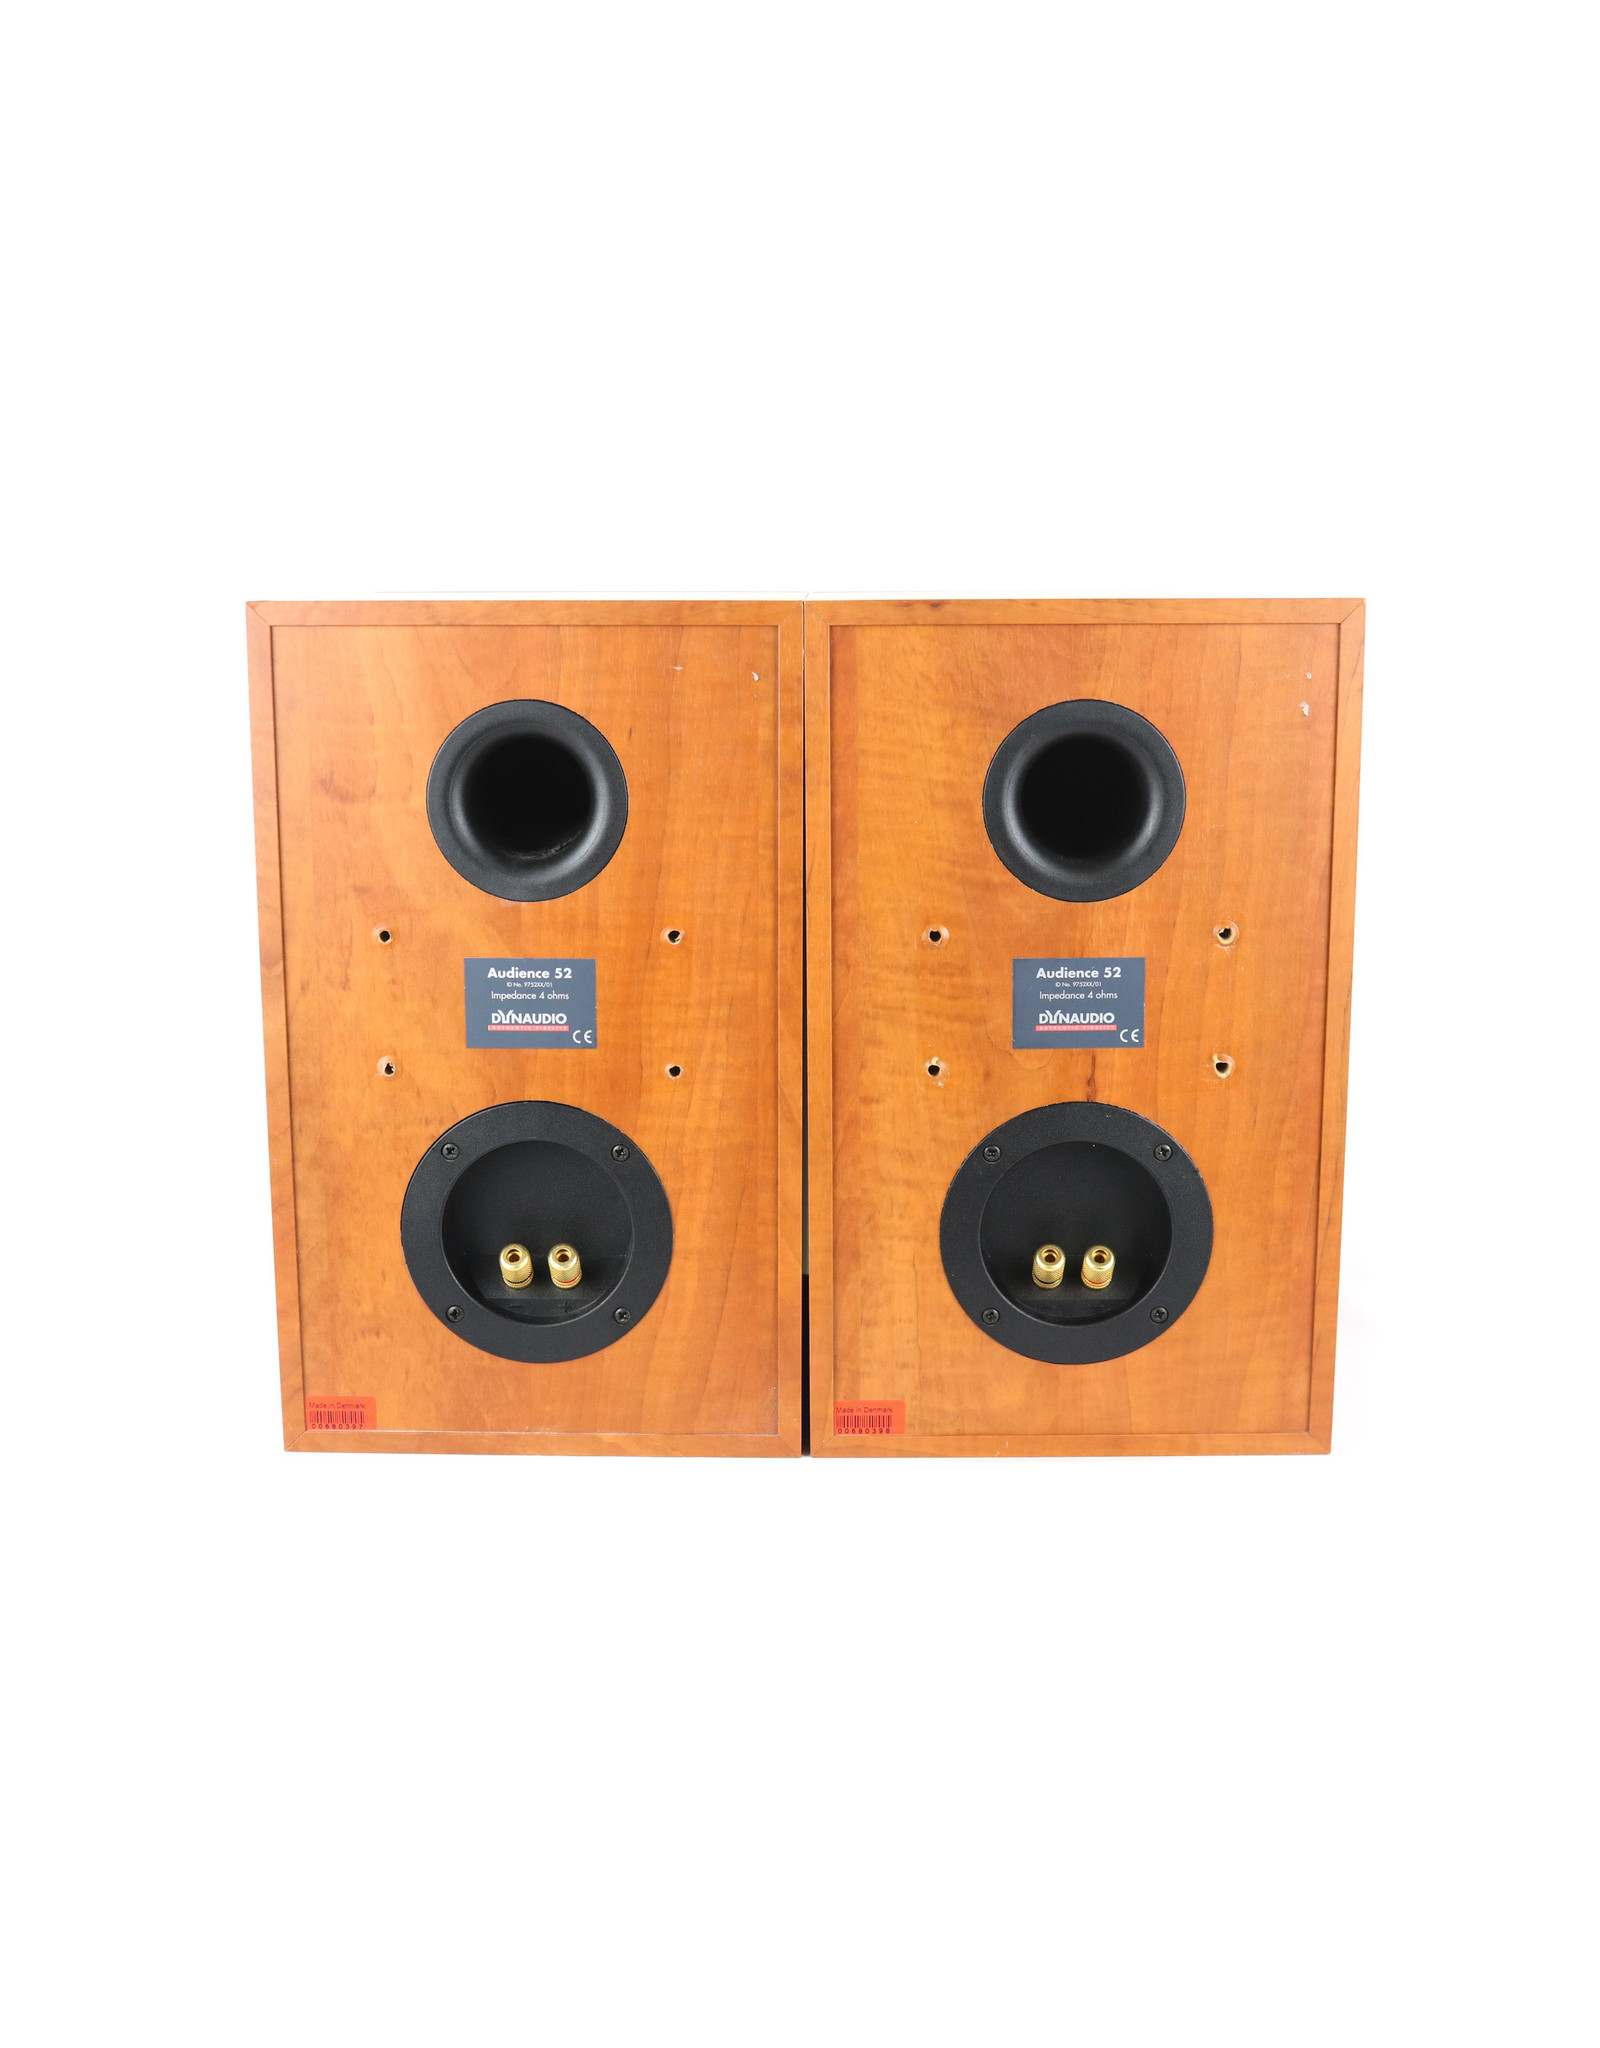 Dynaudio Dynaudio Audience 52 Bookshelf Speakers USED